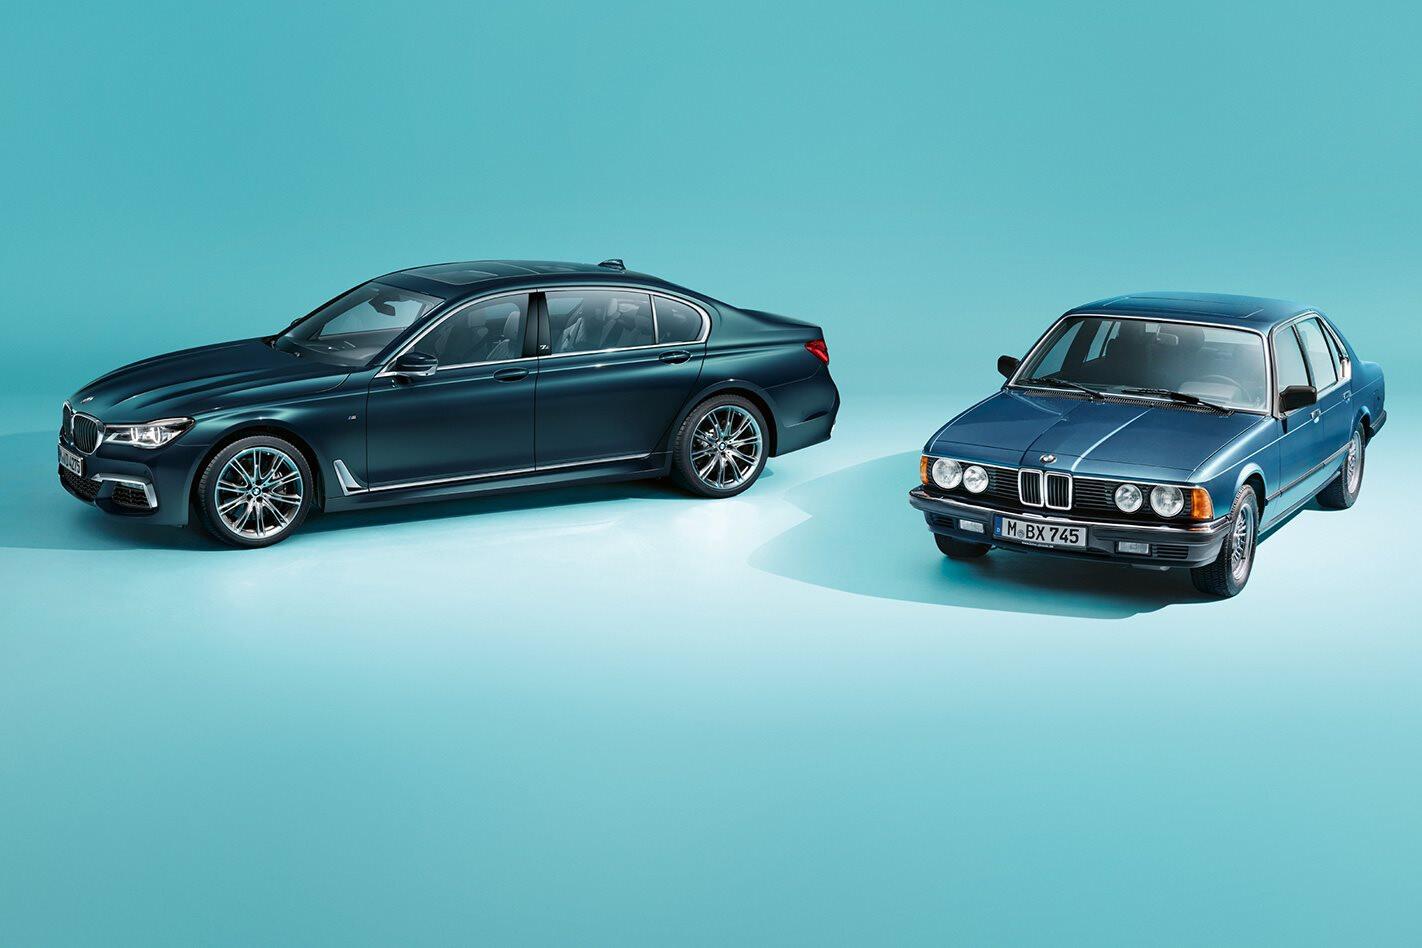 BMW 7 Series celebrates 40 years